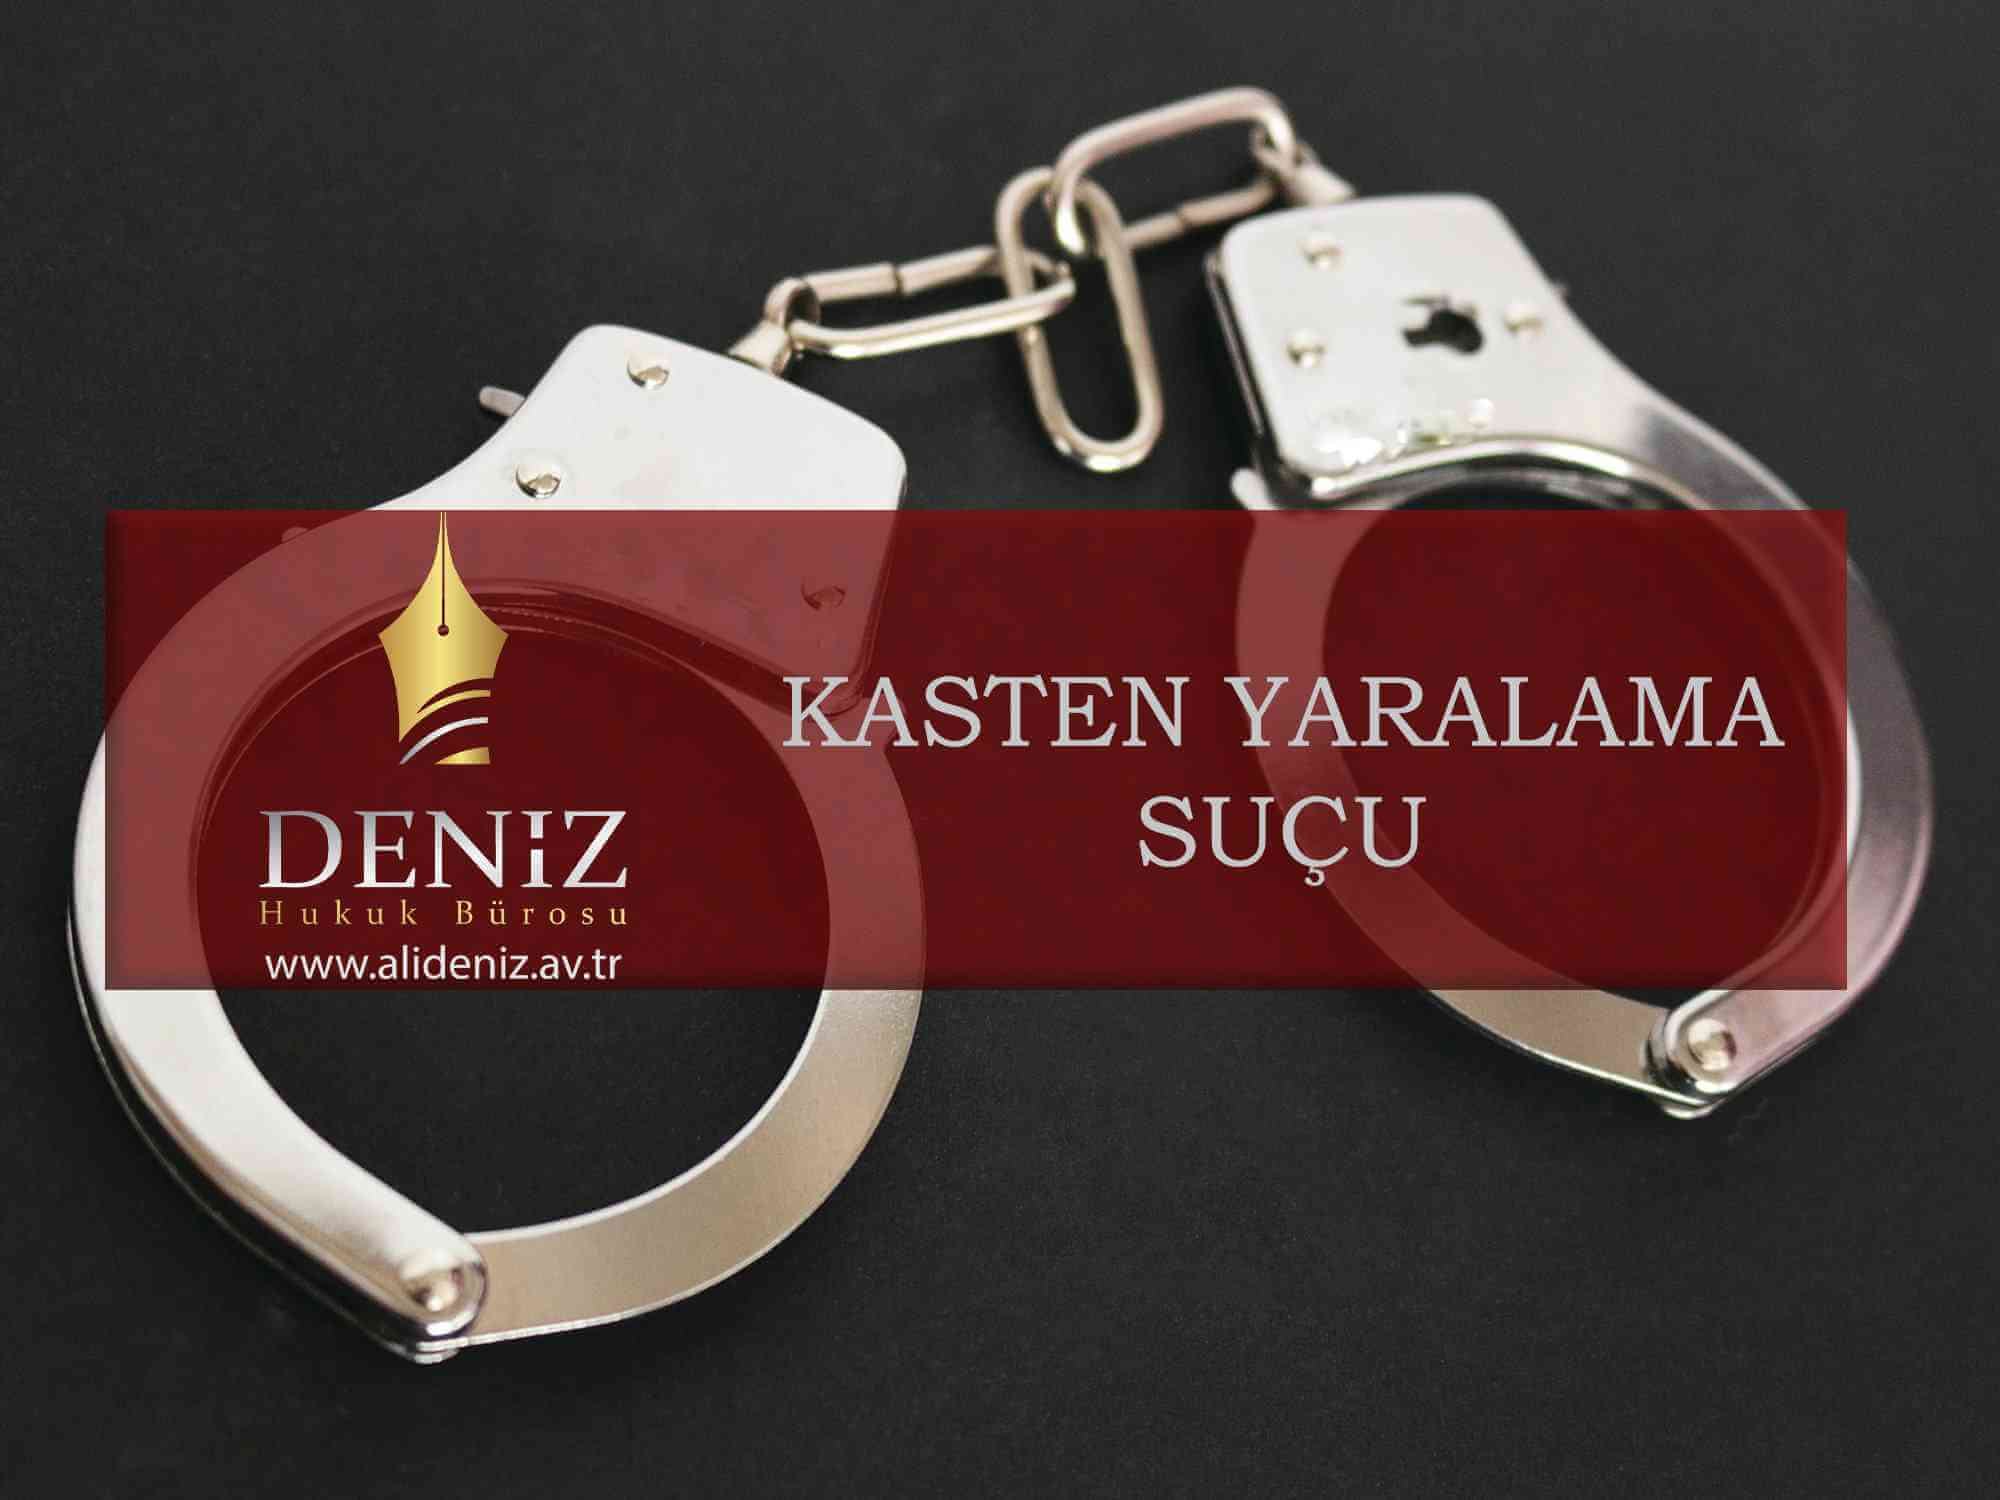 Kasten Yaralama Suçu